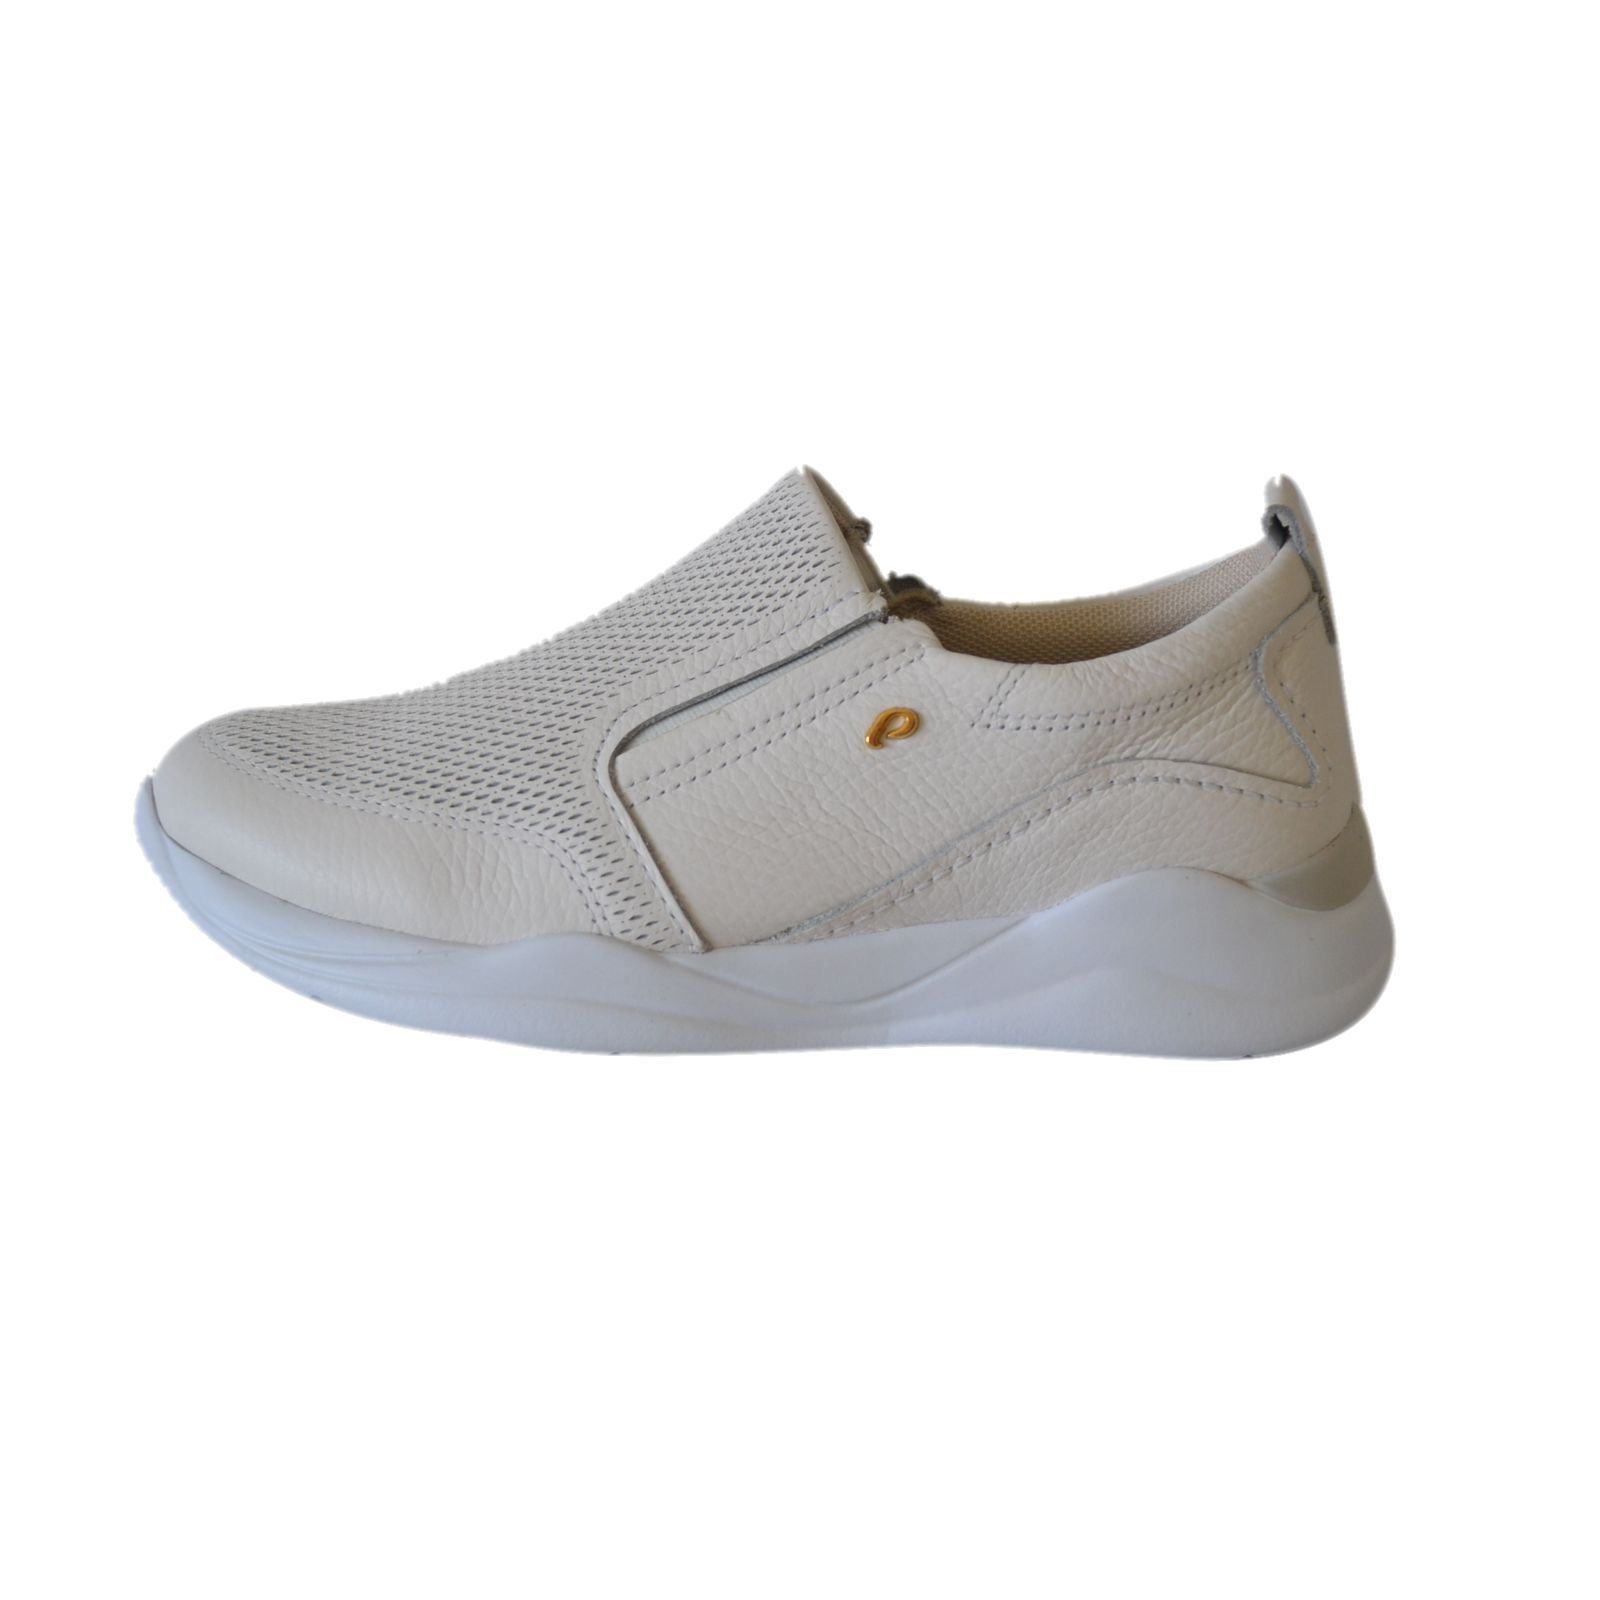 Sapatenis Prata Couro 1009826 Branco